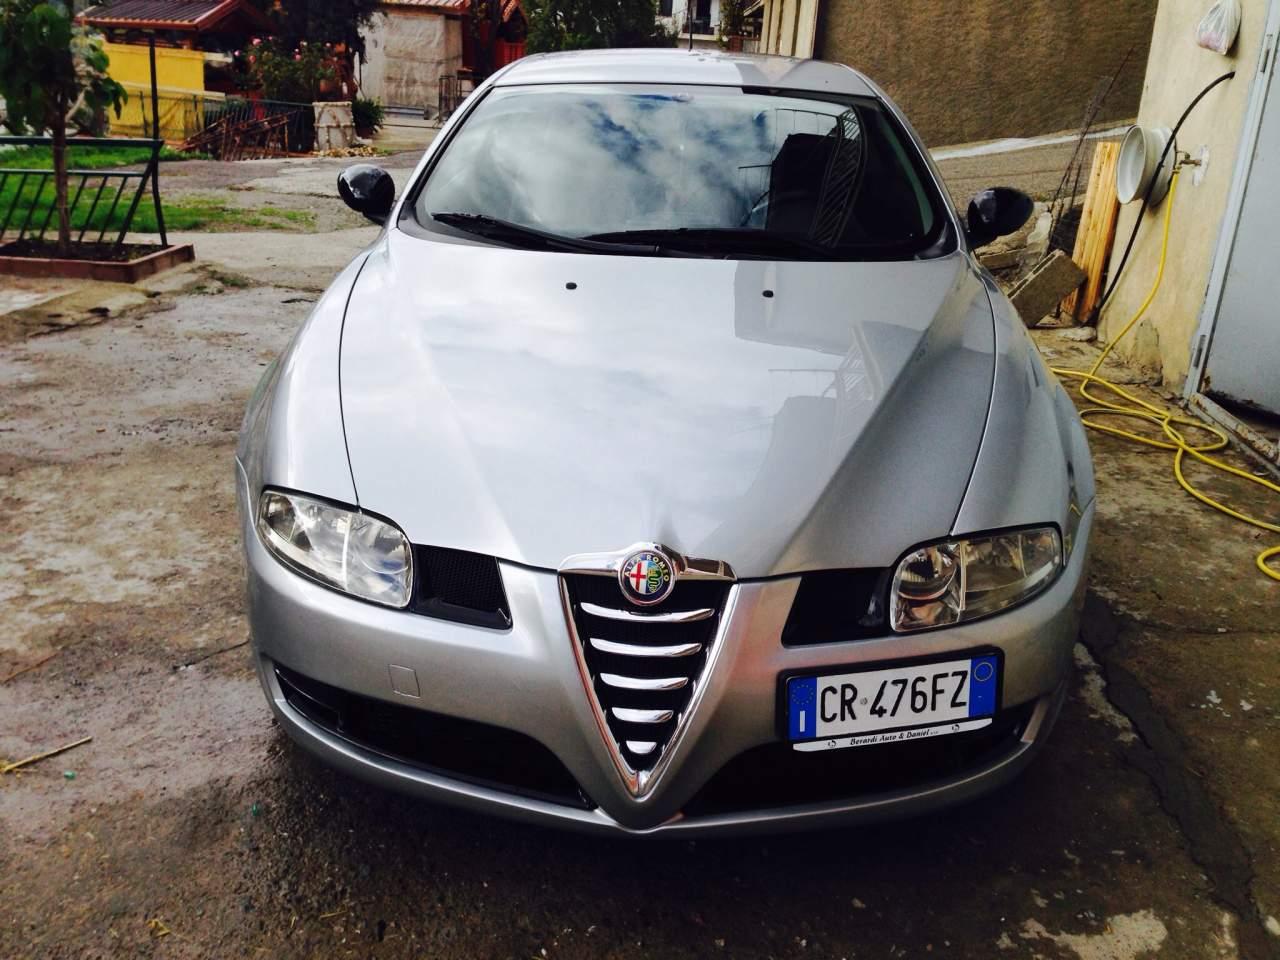 foto Alfa Romeo GT - 1.9 JTDm 150 cv 16 v - distinctiv - grigio sterling - 2005 - CS - {attachcounter}